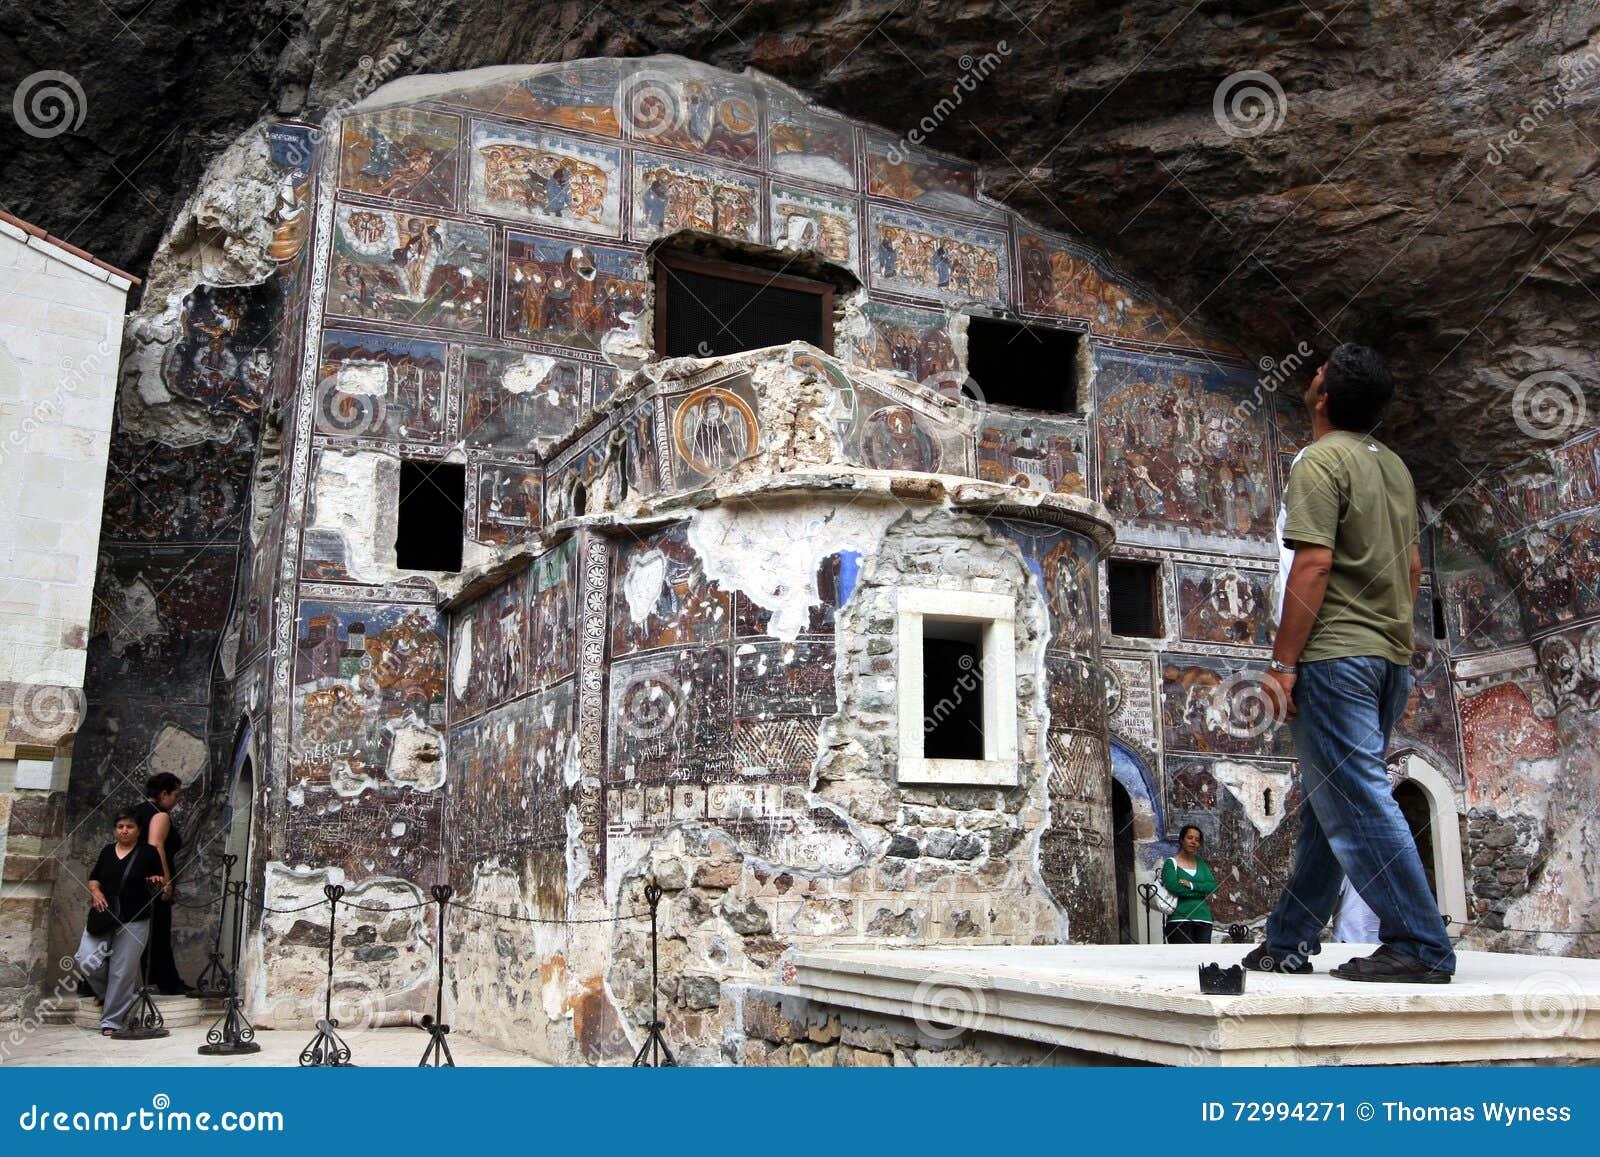 Sumela Monastery près de Trabzon sur la côte de la Mer Noire de la Turquie